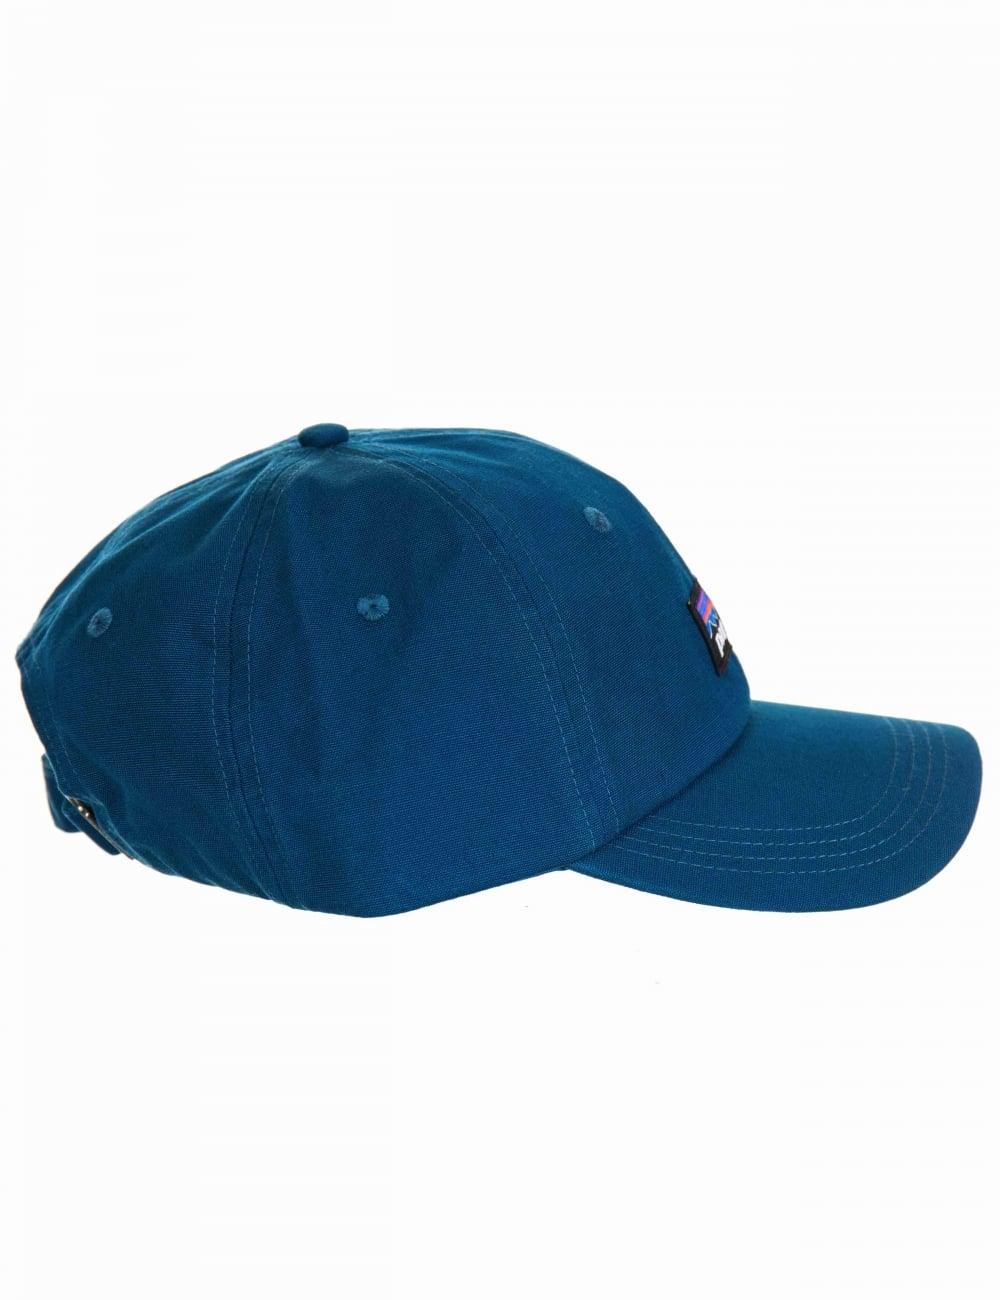 3ce5848a857 Patagonia P-6 Logo Trad Cap - Big Sur Blue - Accessories from Fat ...